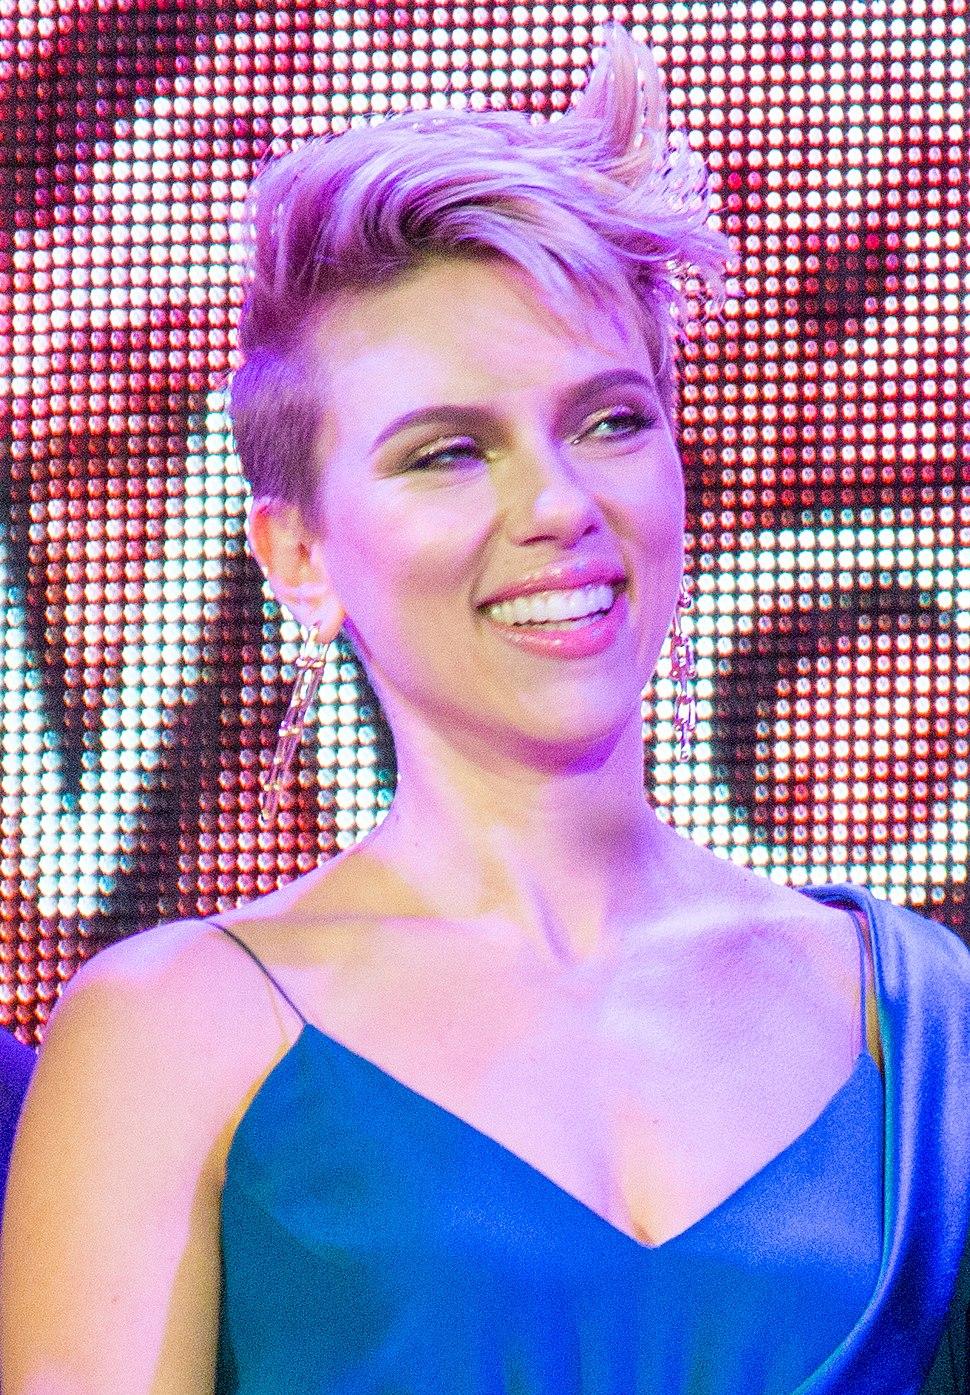 Ghost In The Shell World Premiere Red Carpet-Scarlett Johansson (37147912300)